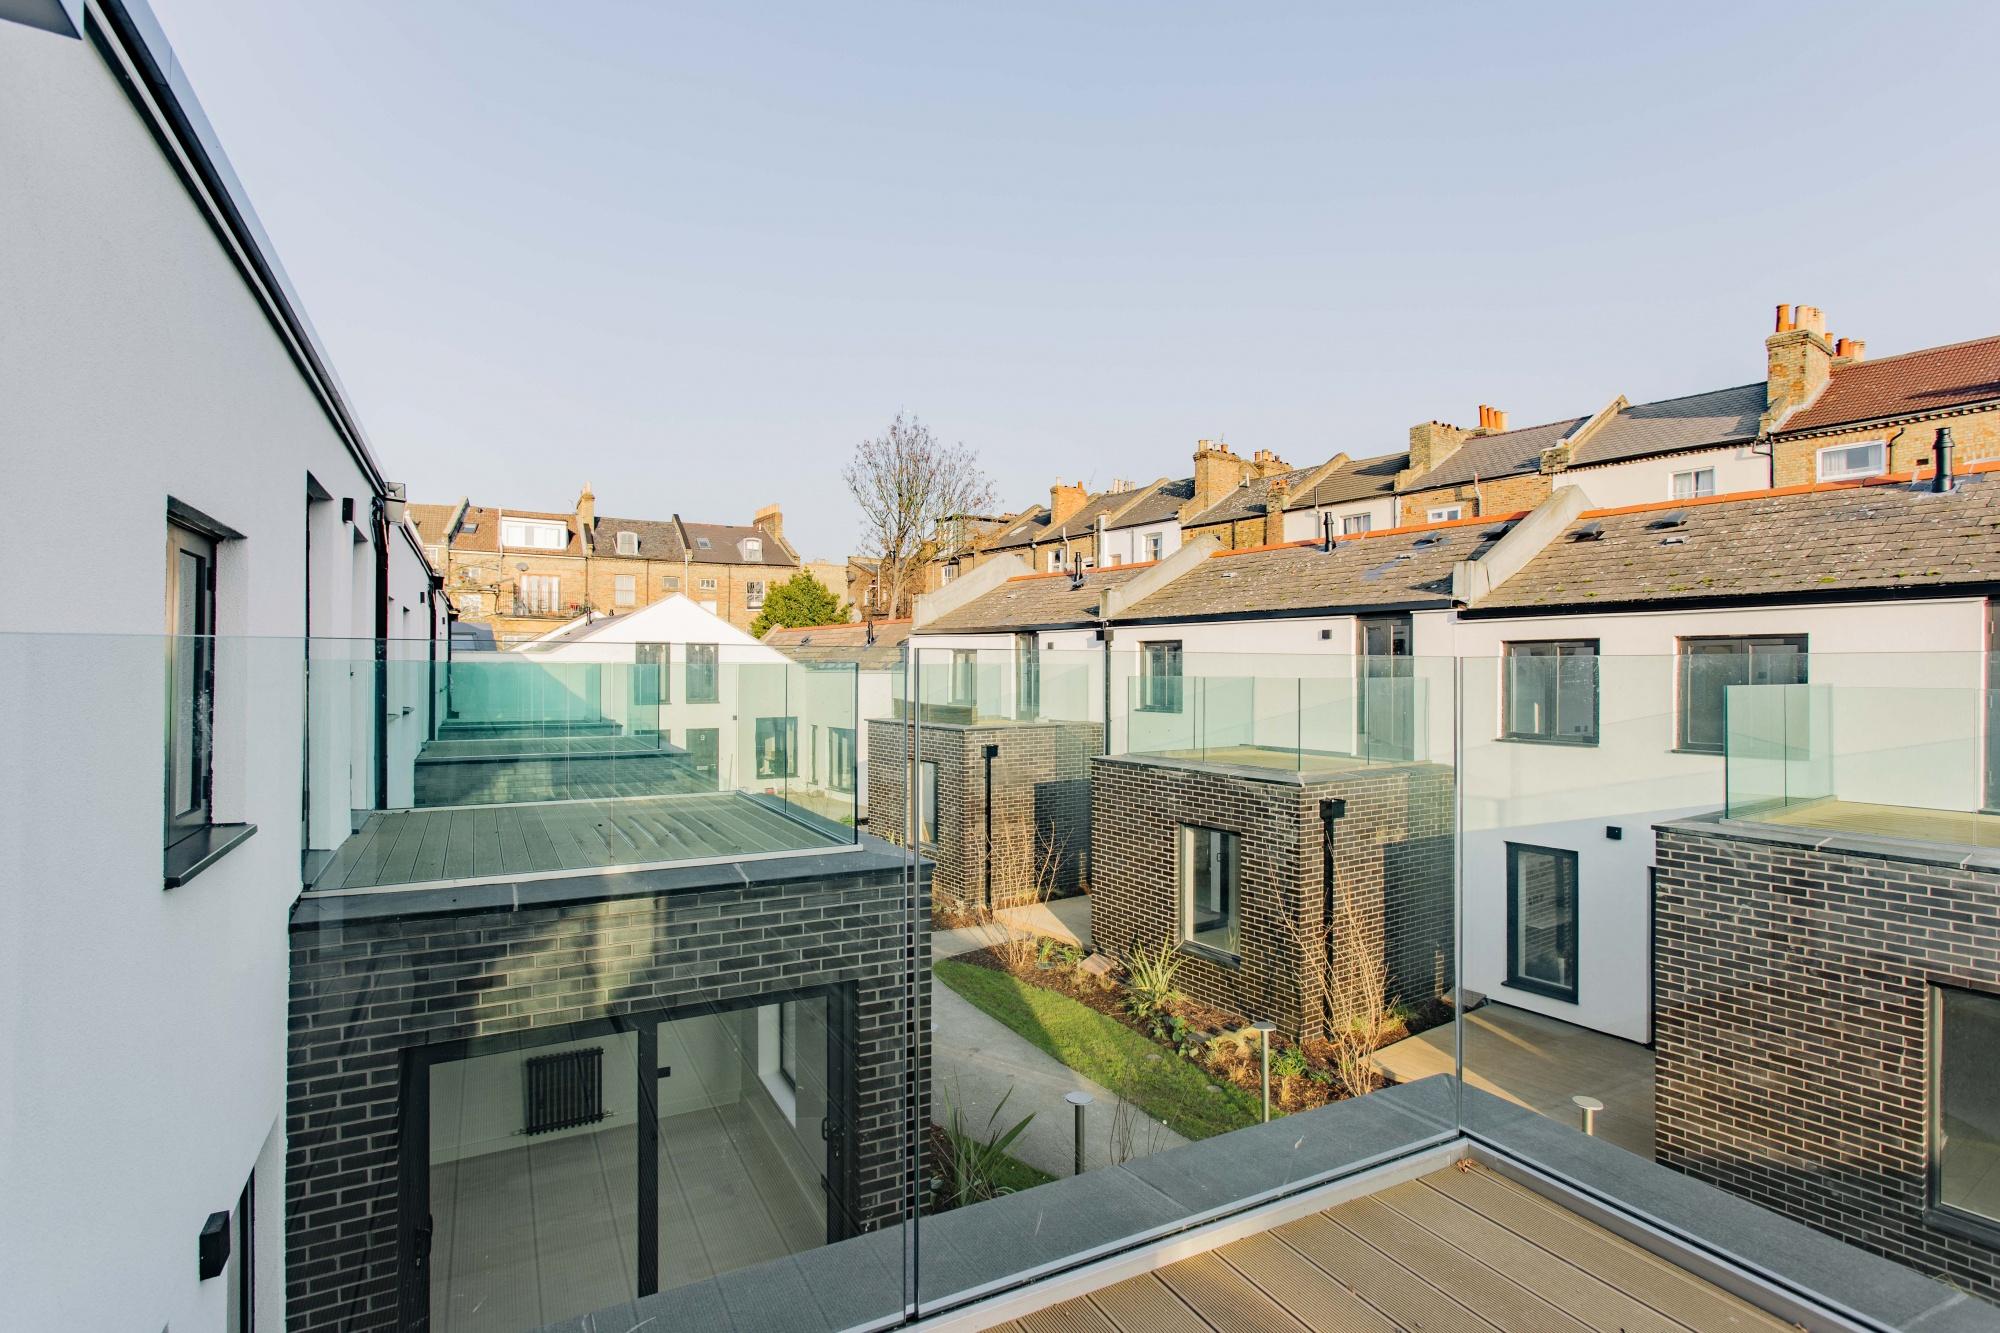 Property development photographs, property photography, estate agent, property developer, london, uk